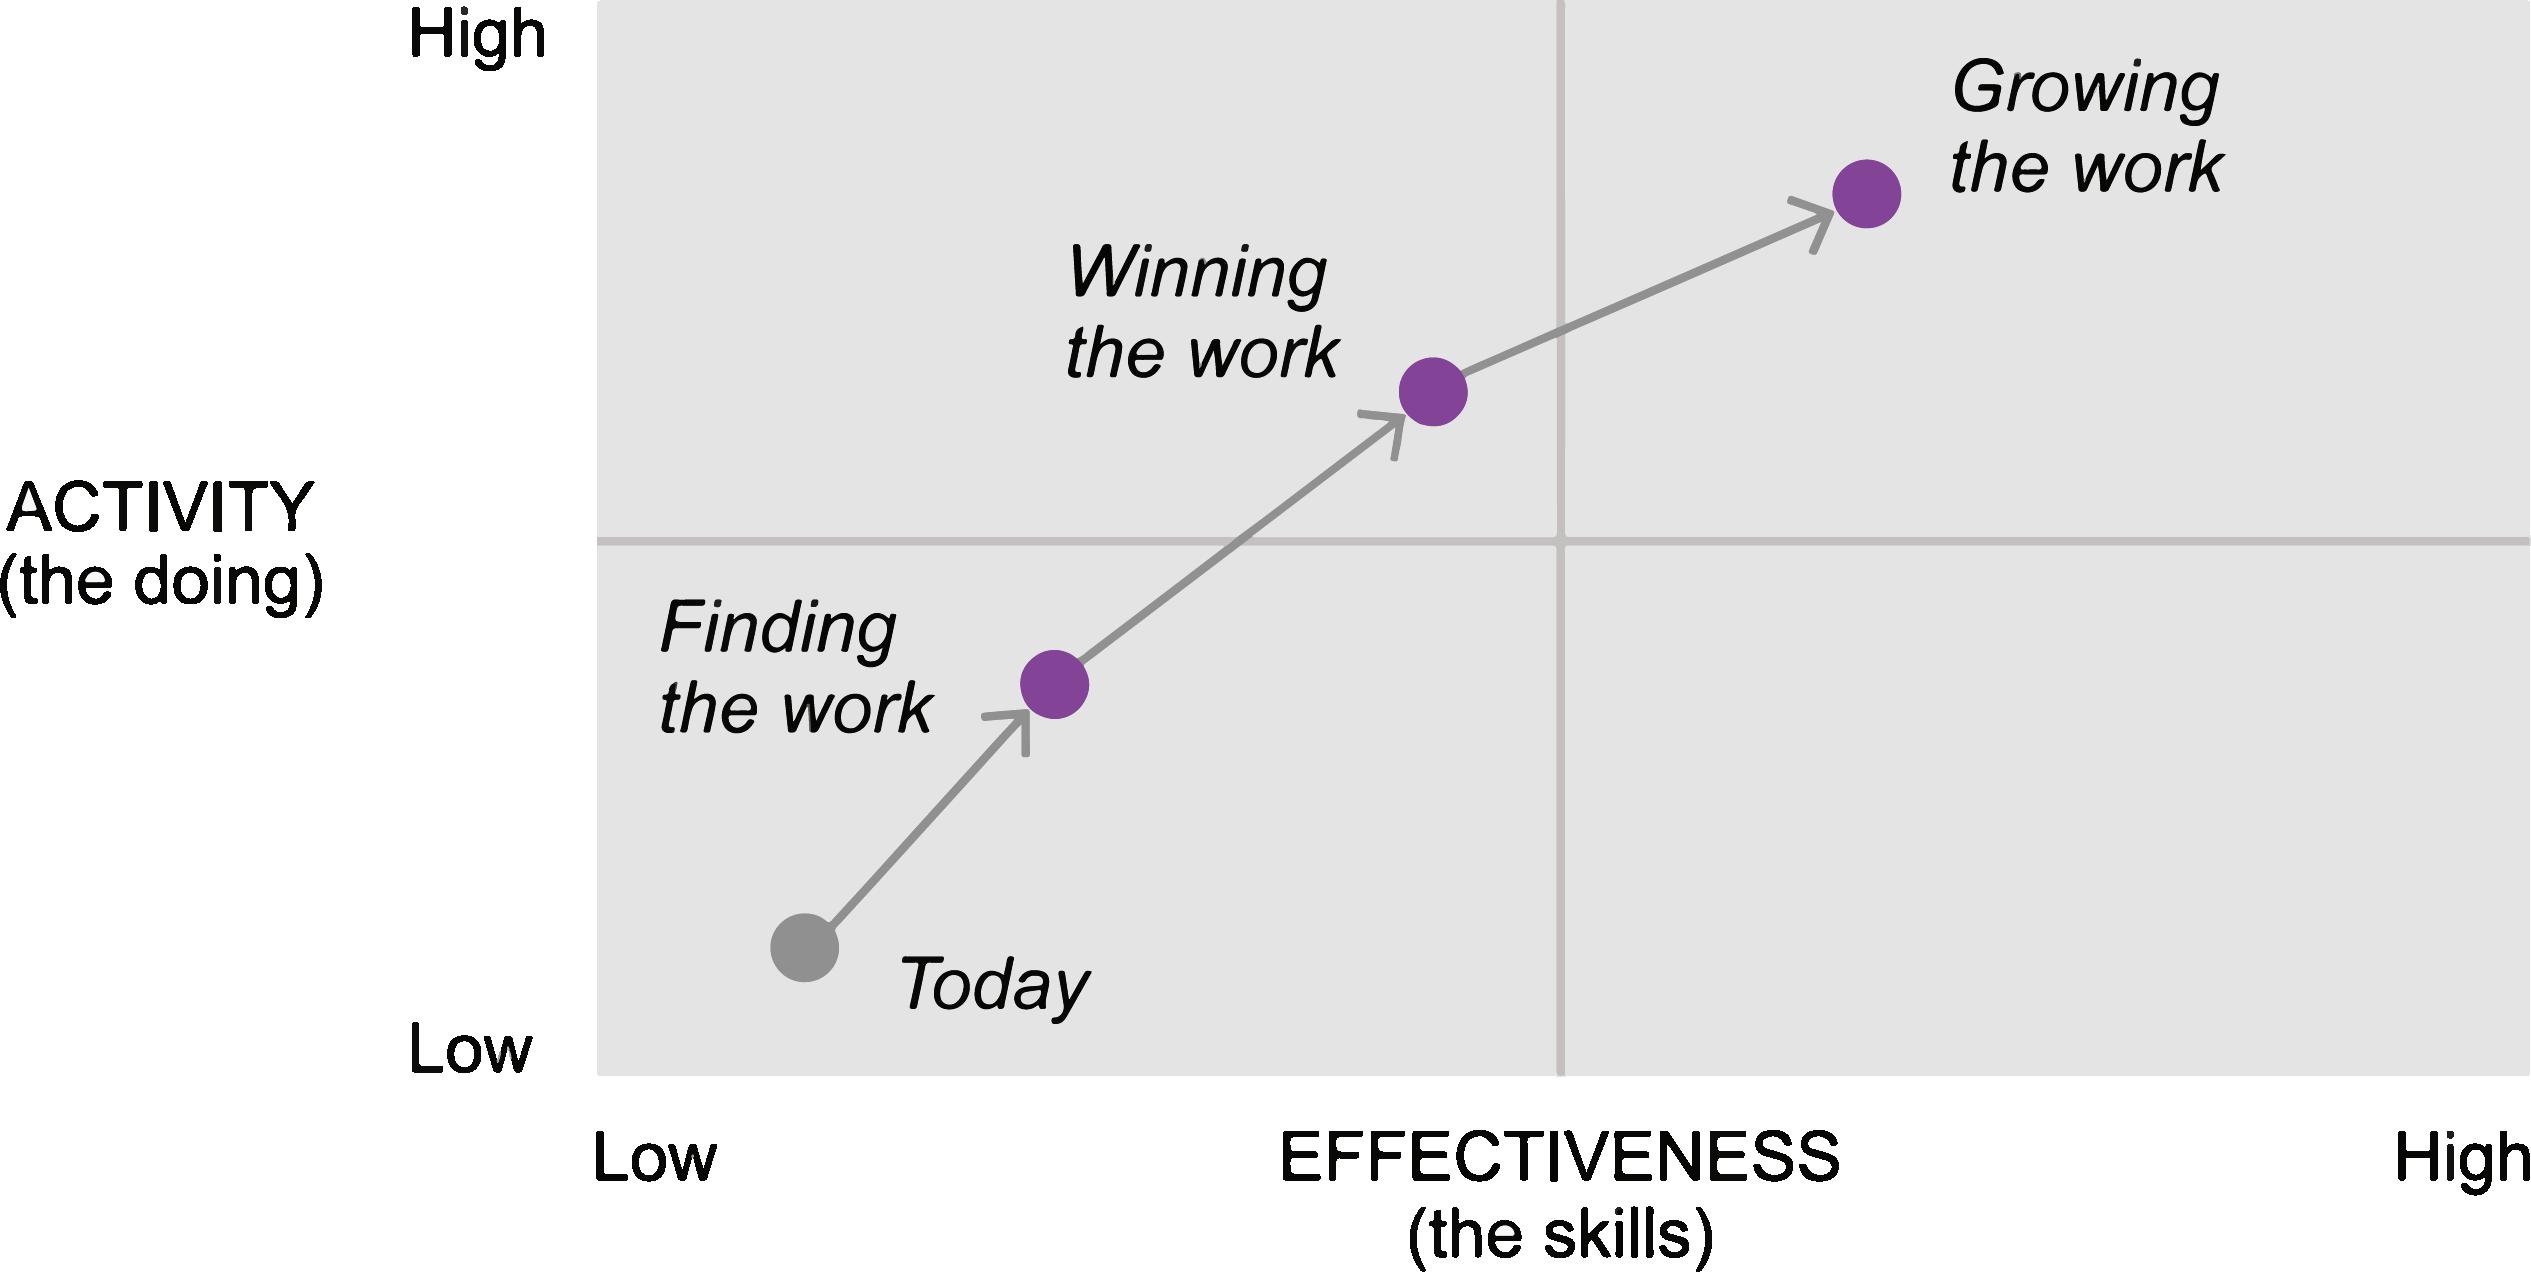 activity-effectiveness-curve@400ppi